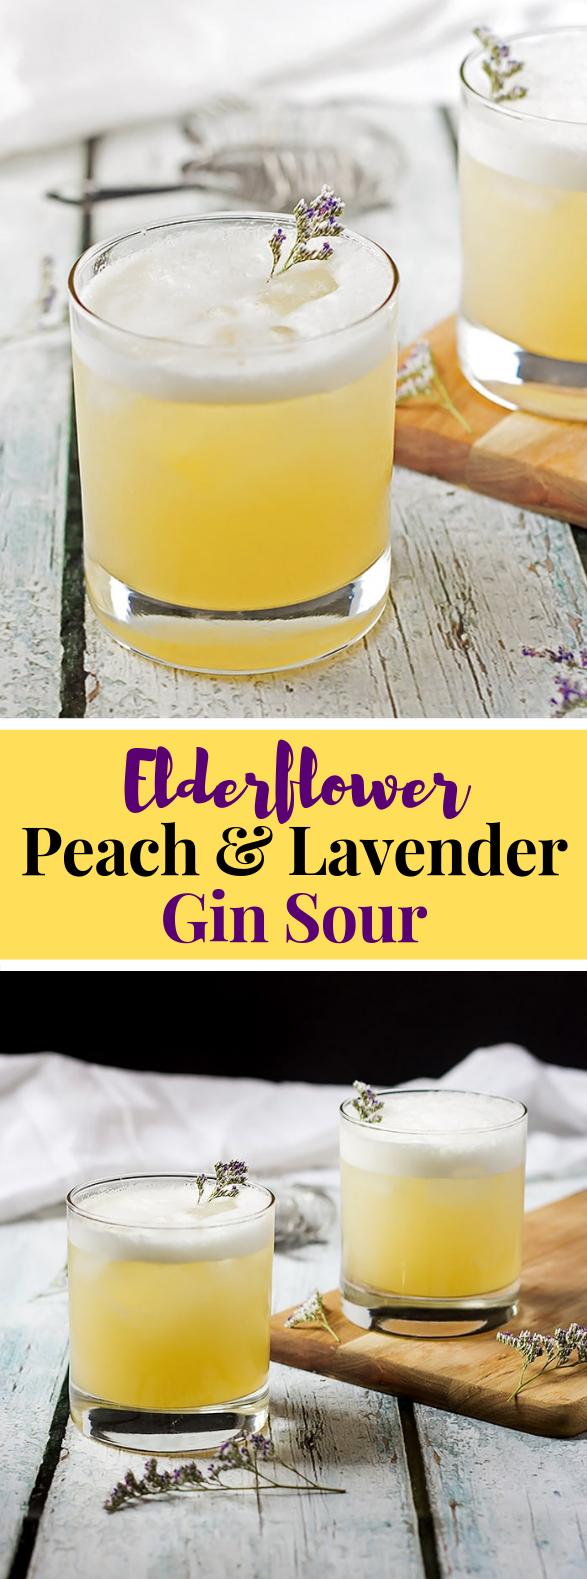 Elderflower, Peach and Lavender Gin Sour #drinks #cocktail